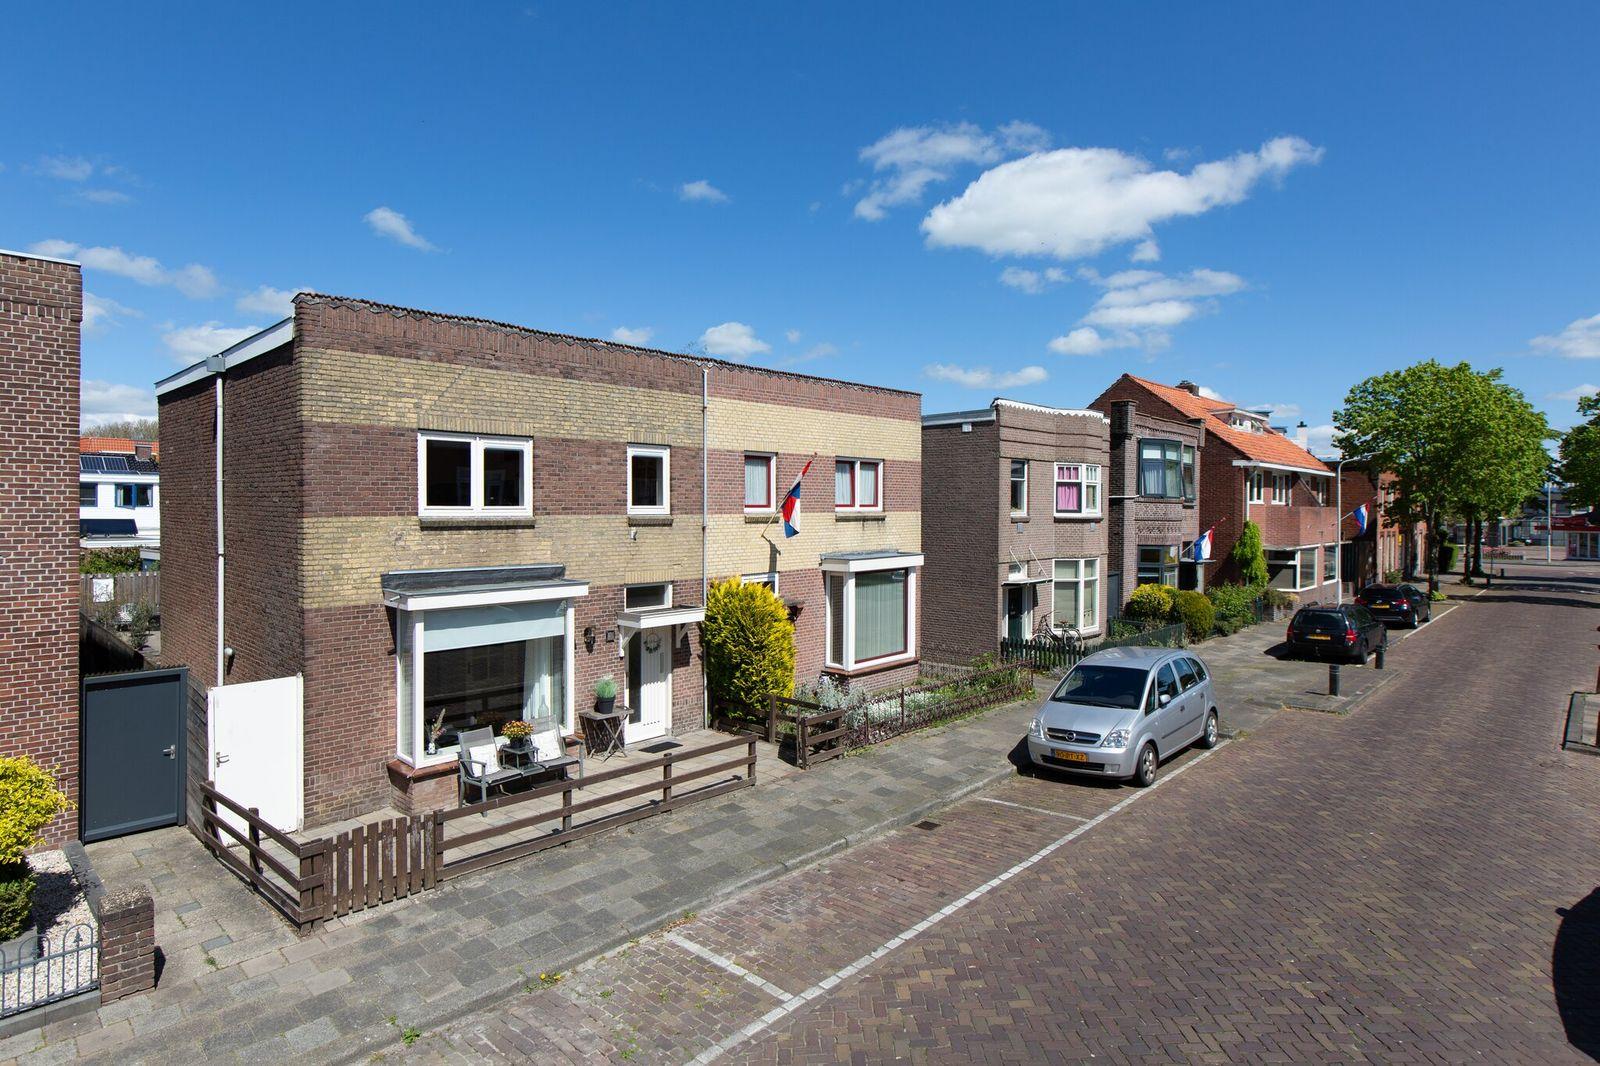 Willem Lodewijkstraat 47, Sneek